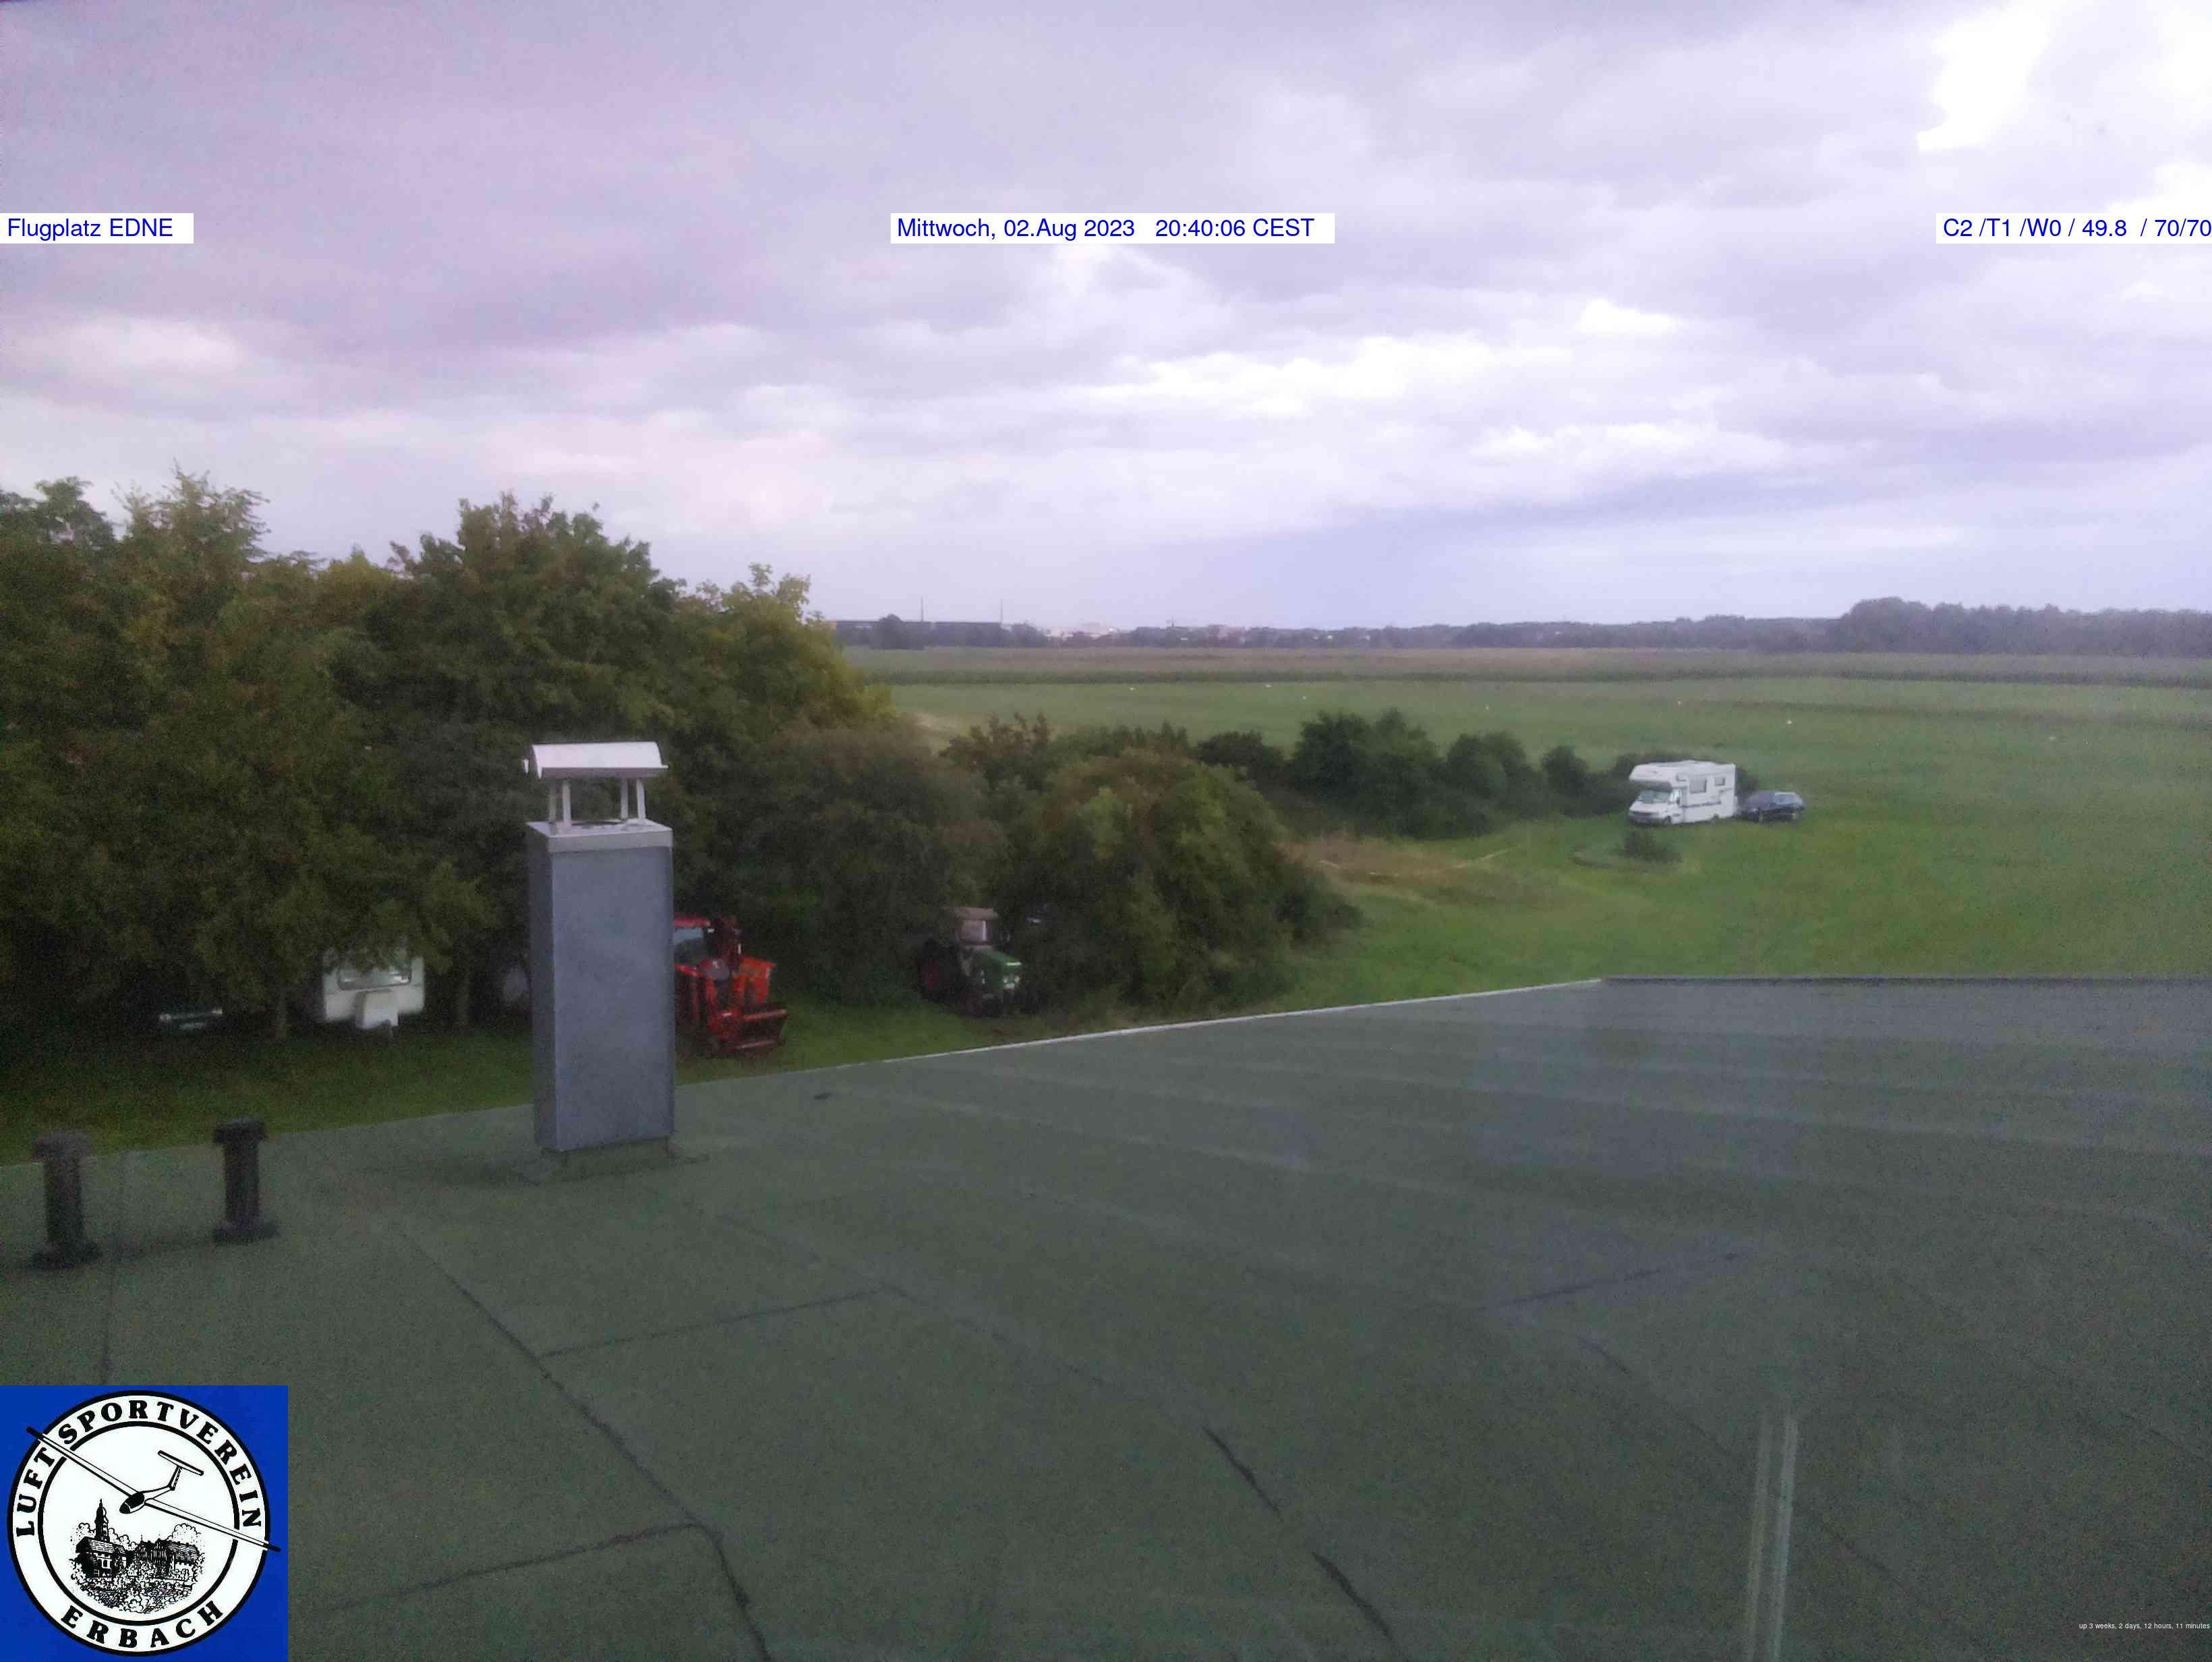 Erbach Flugplatz EDNE 03